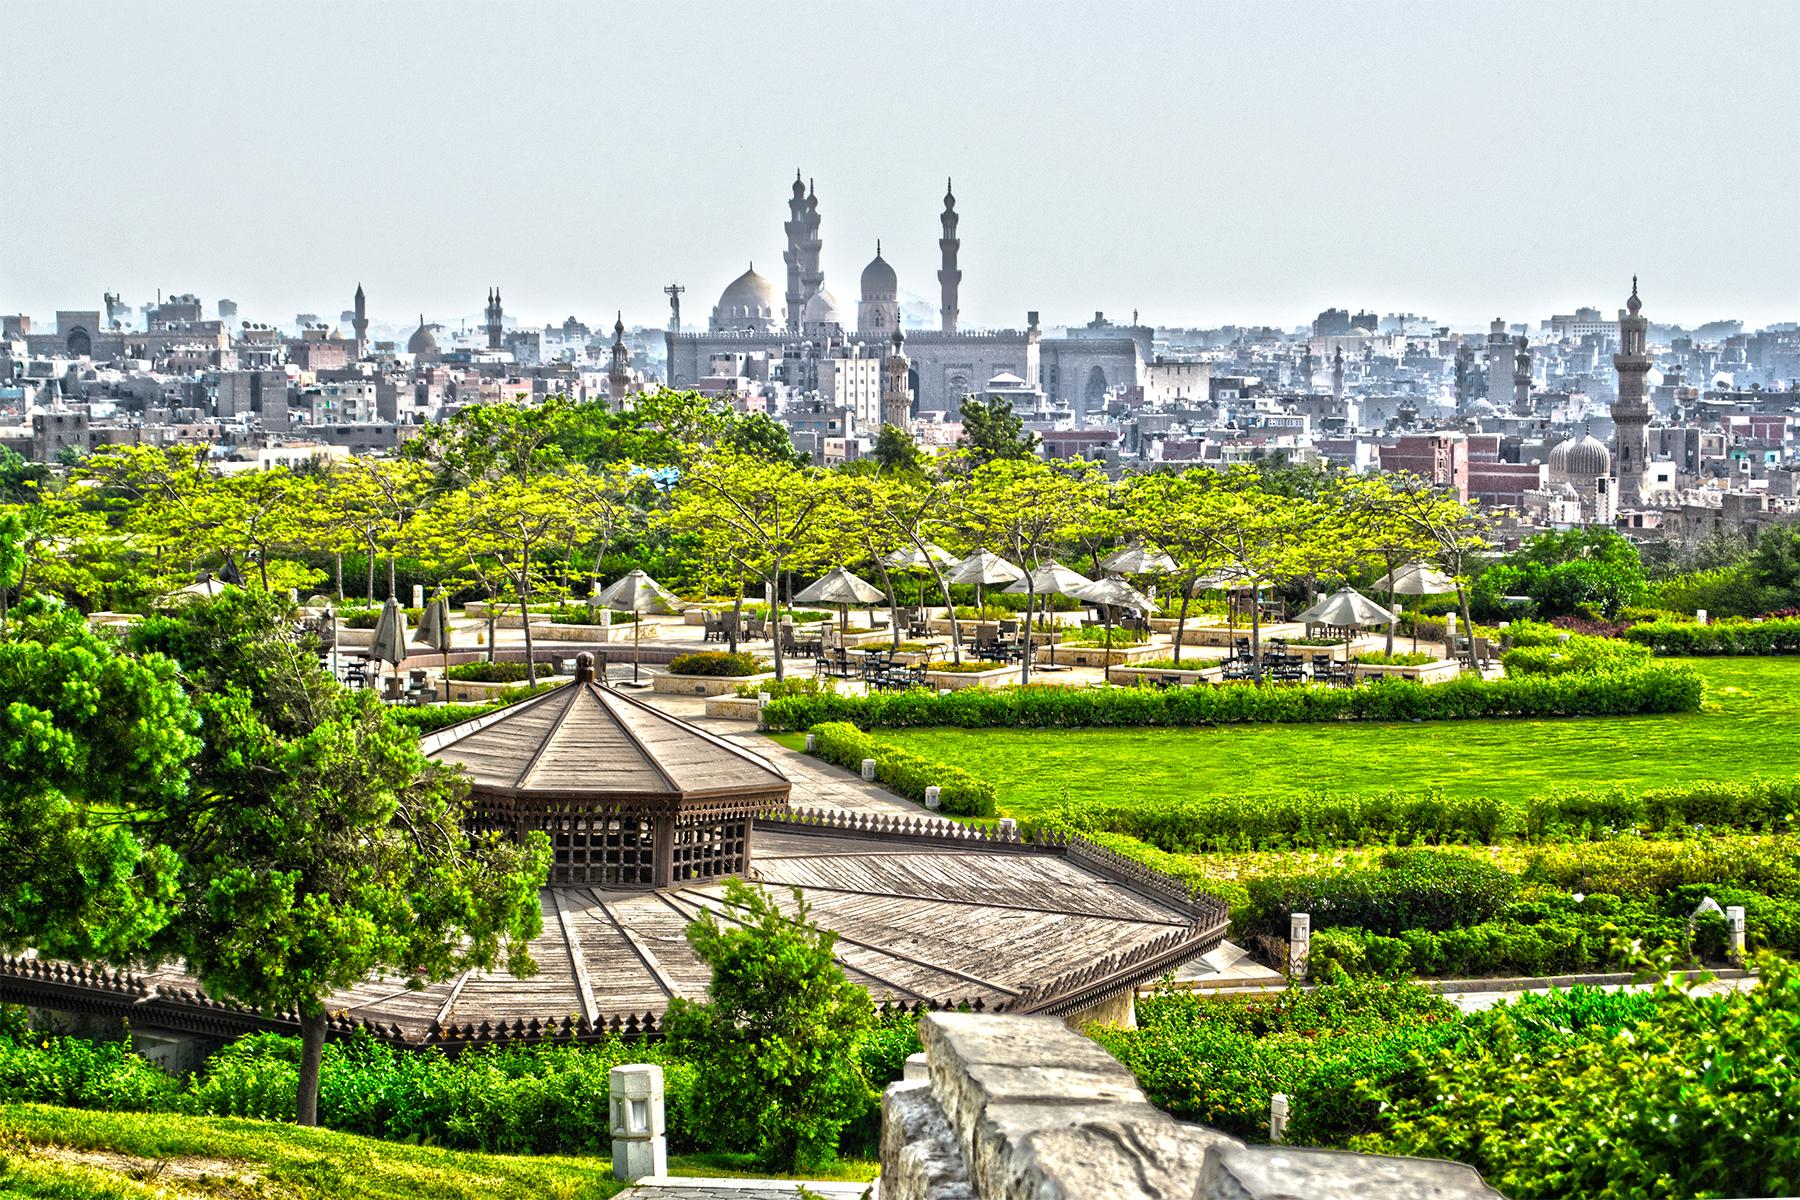 Al-Azhar Park - Wikipedia